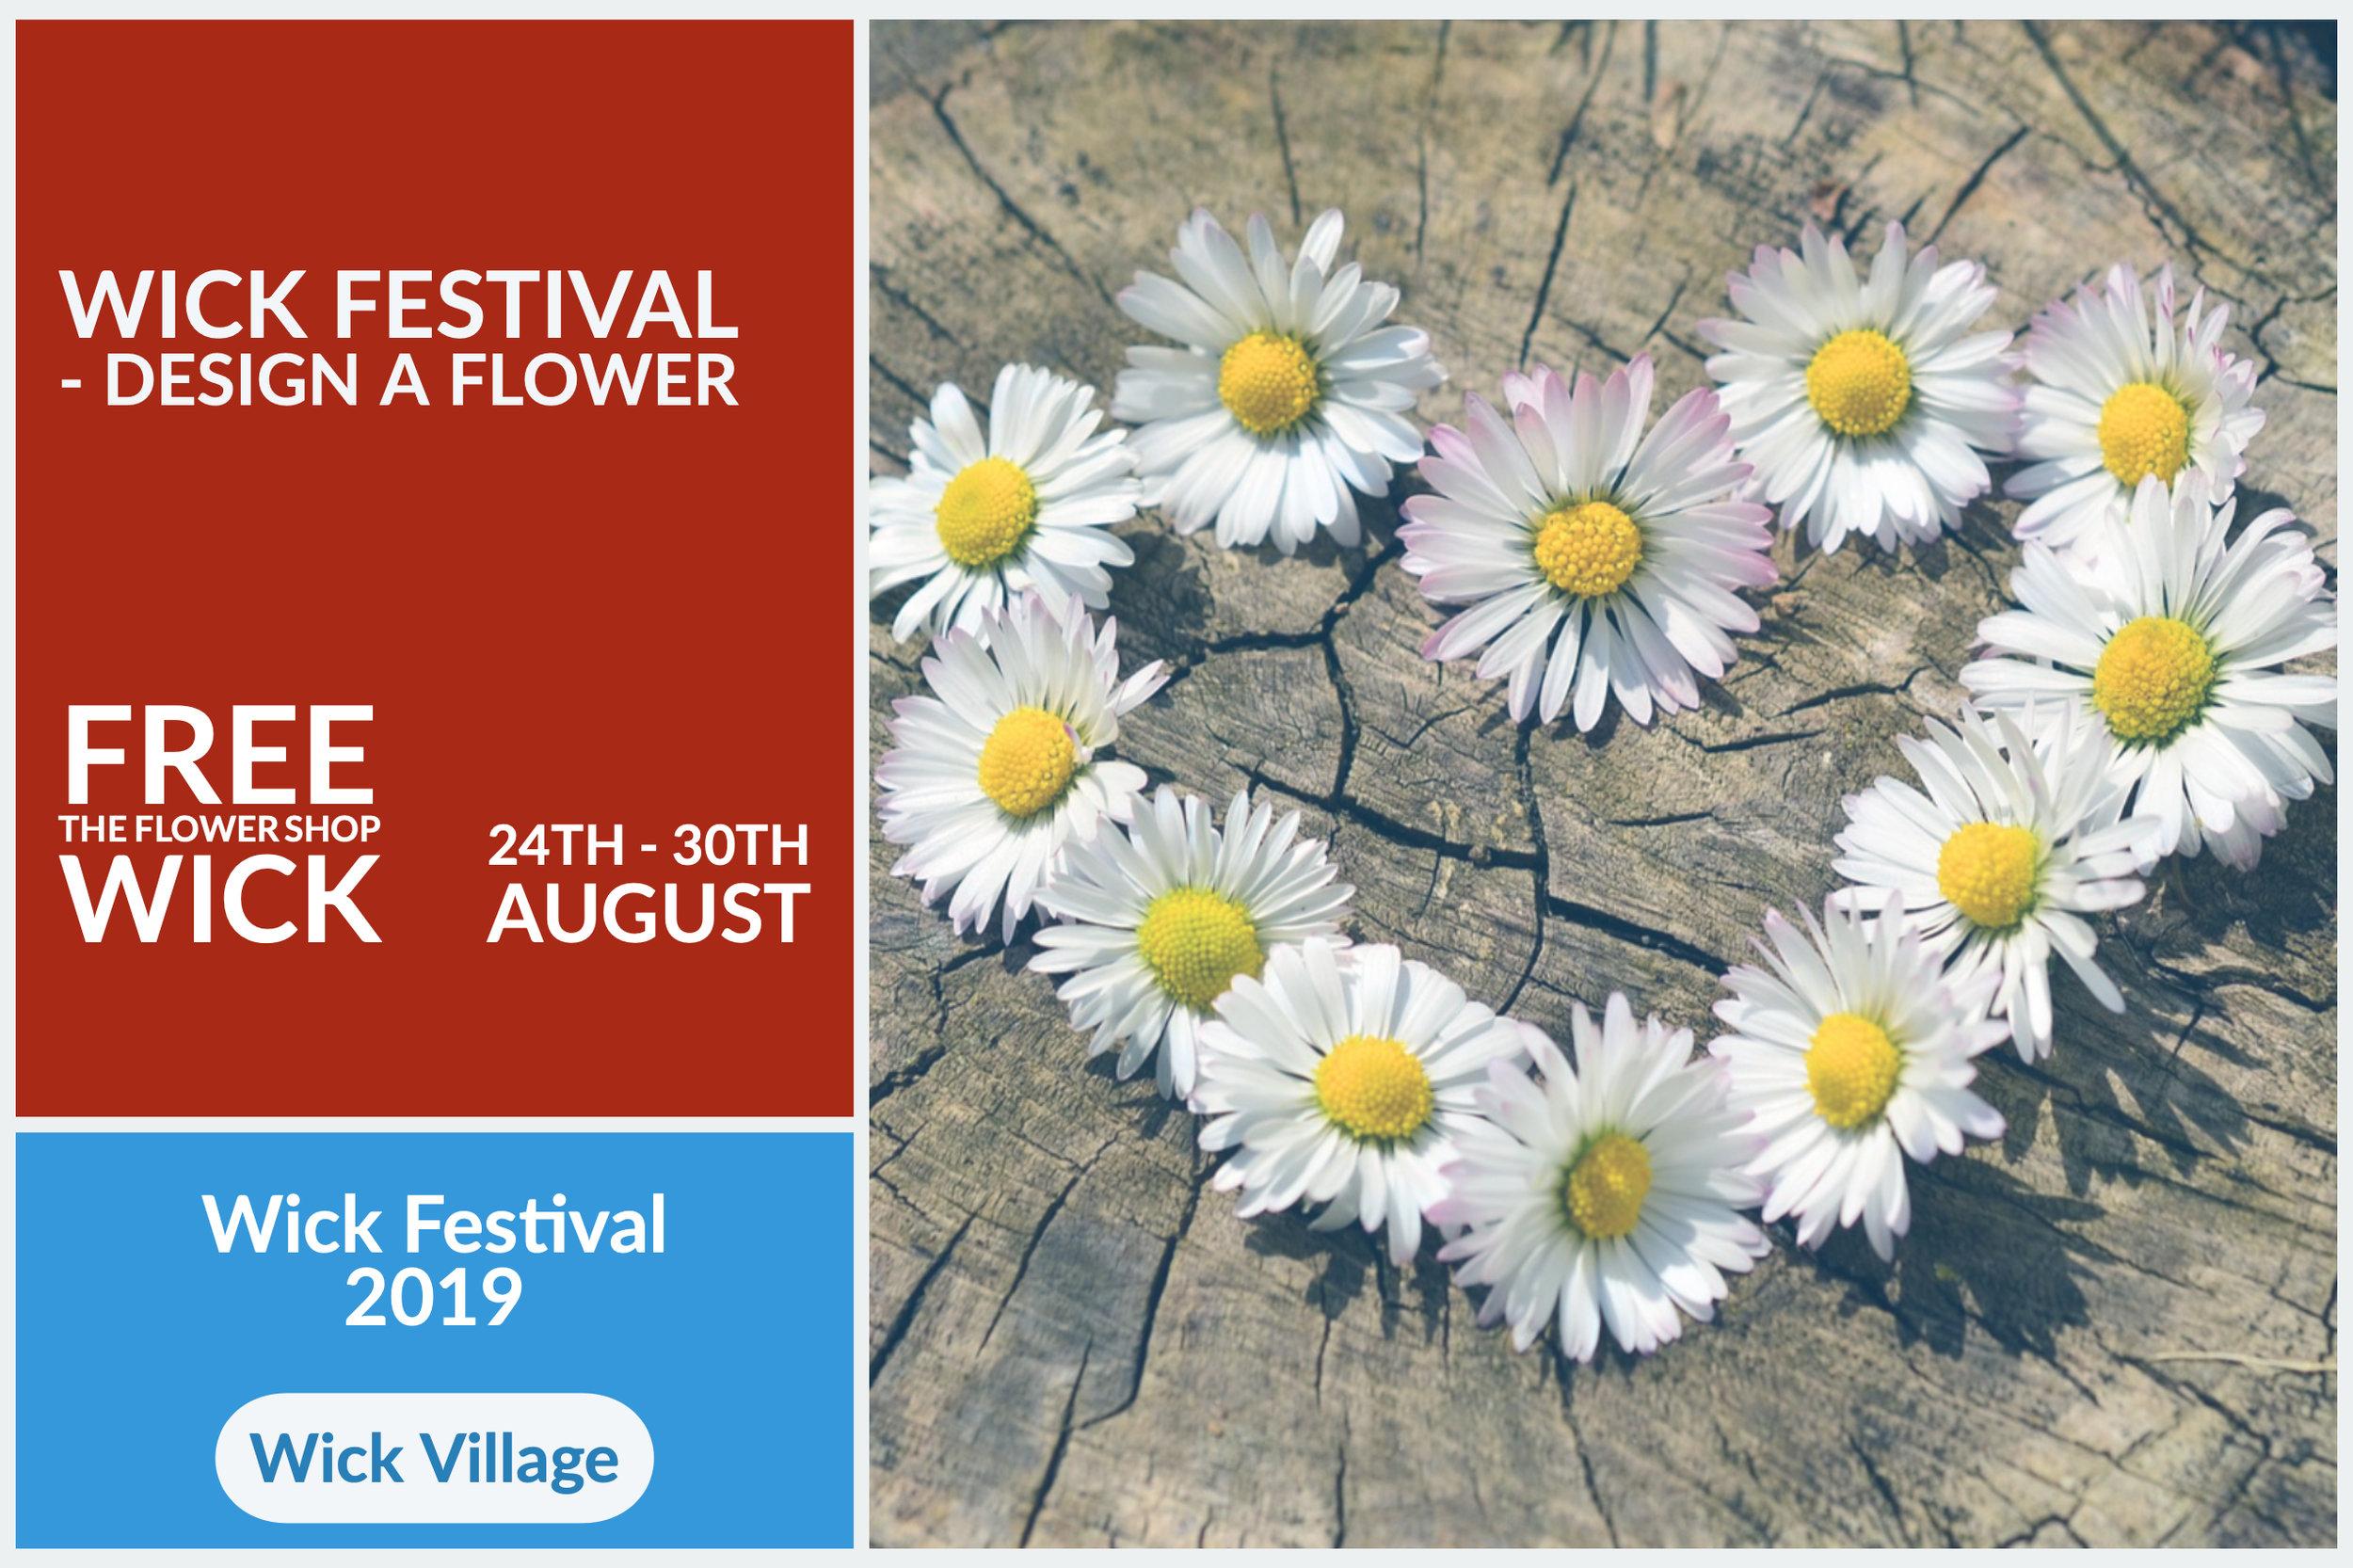 Wick Festival - Design A Flower